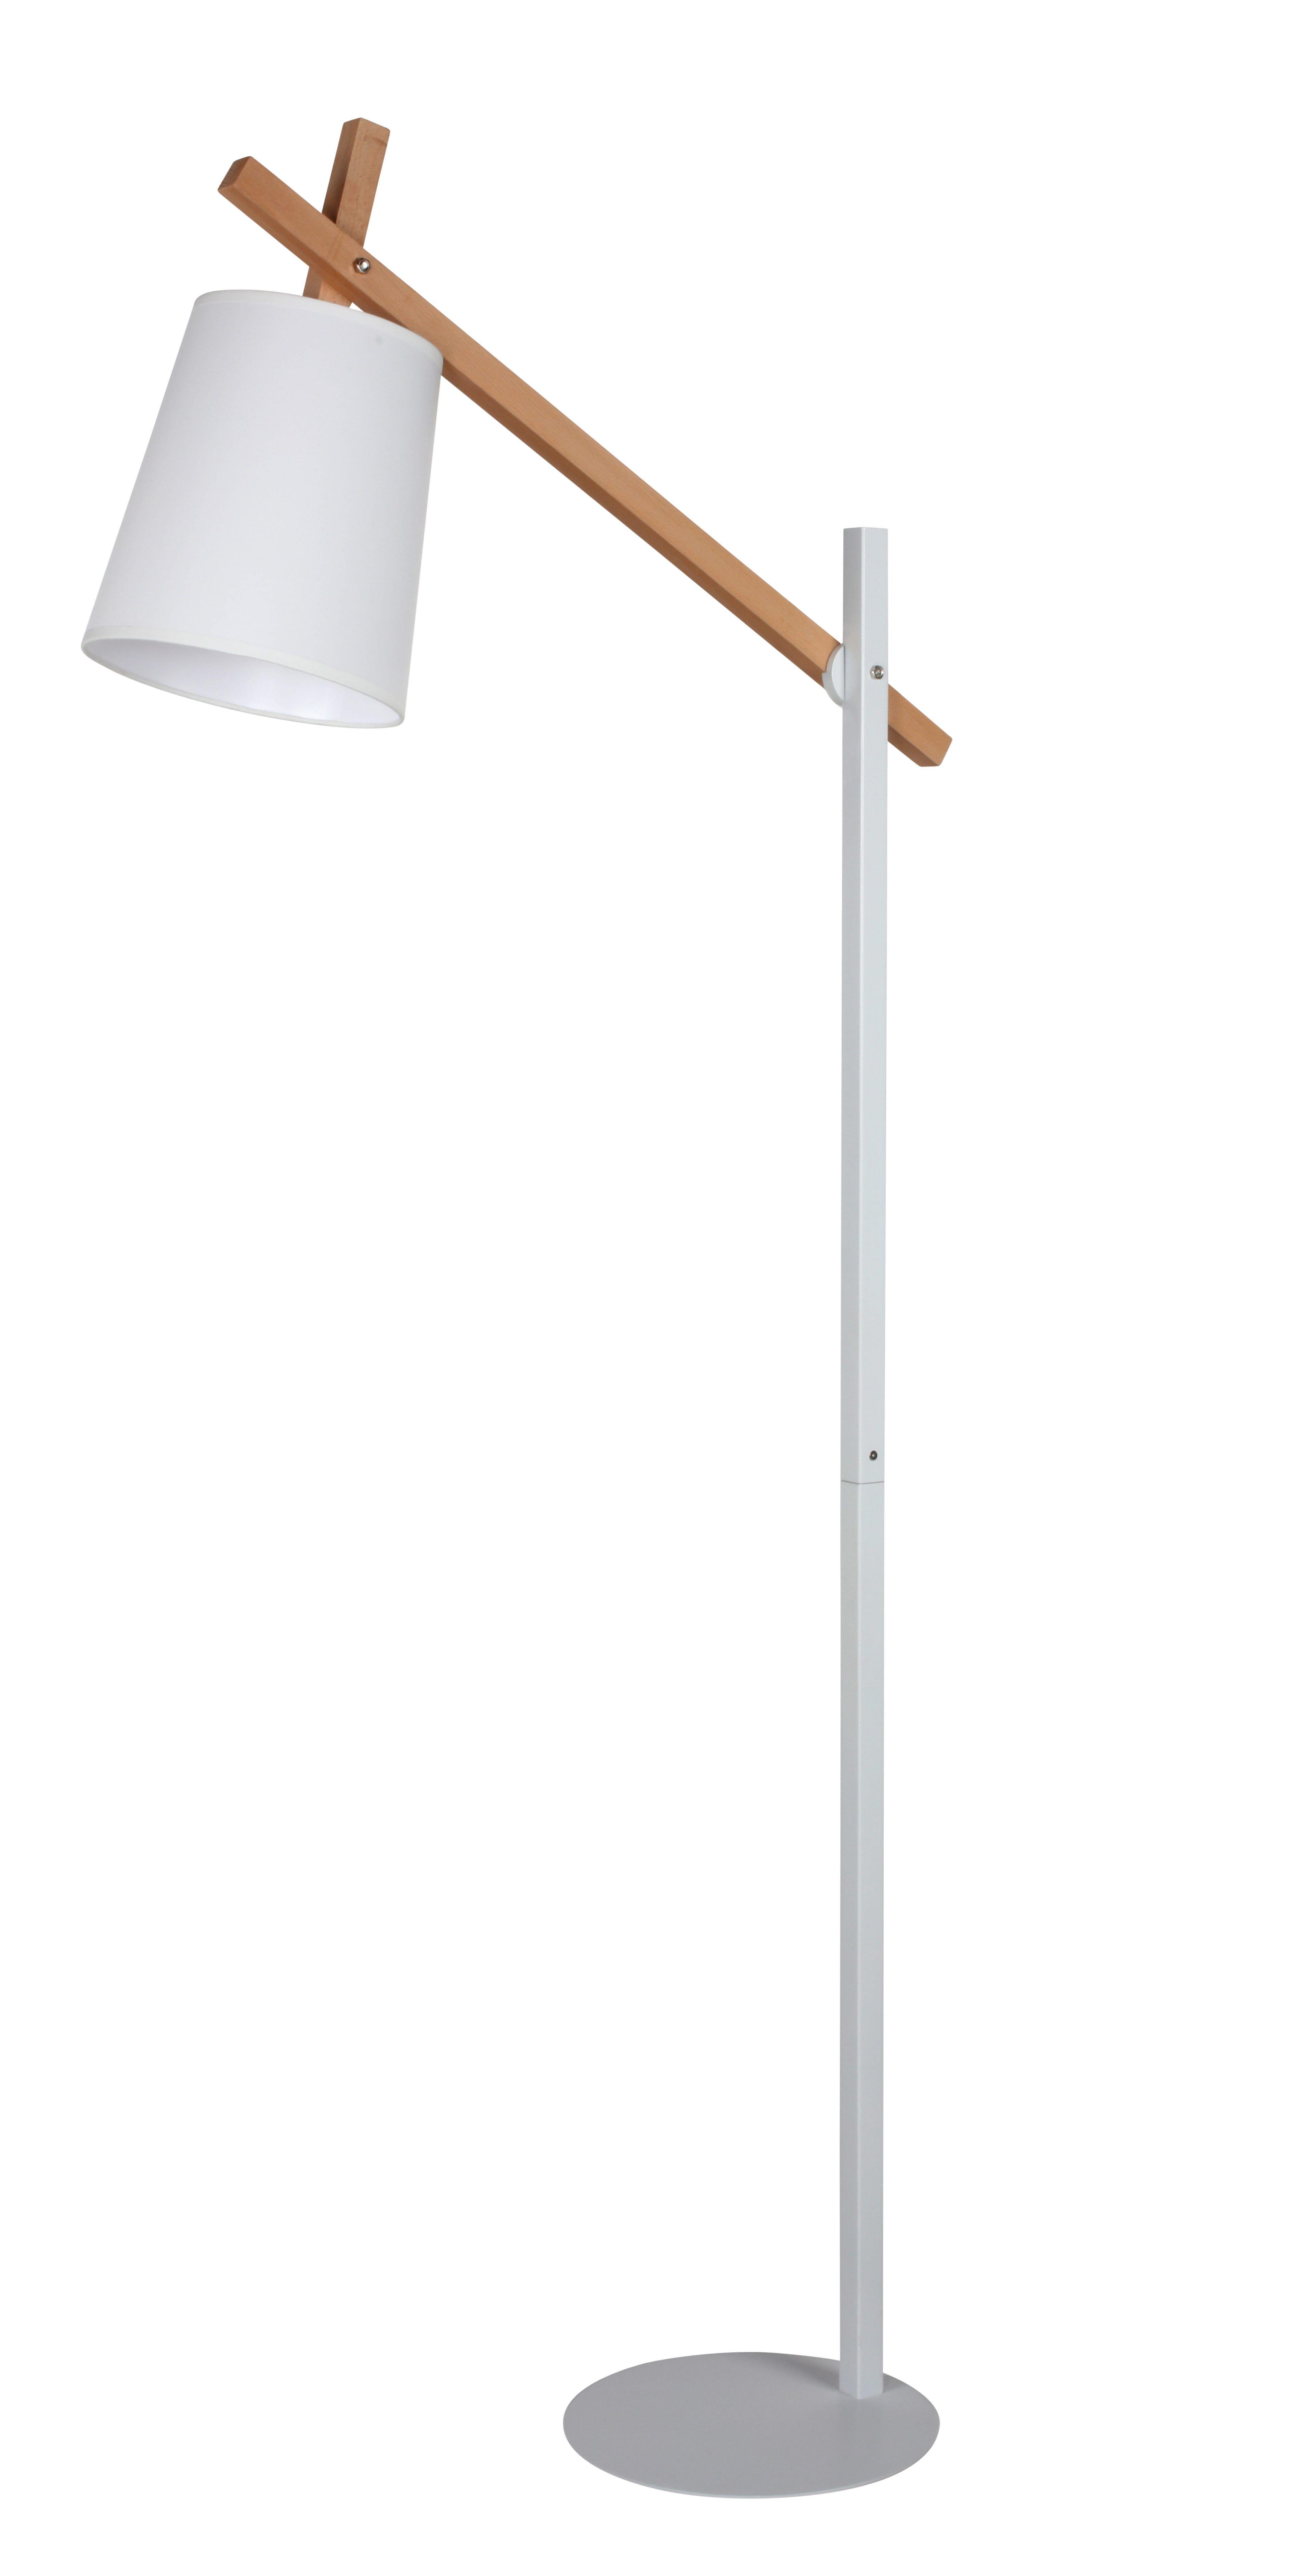 Un Salon Epure Et Scandinave Lampadaire Blanc Blanc Hetre But Decorationscandinave Scandinavian Floor Lamps Floor Lamp Lamp